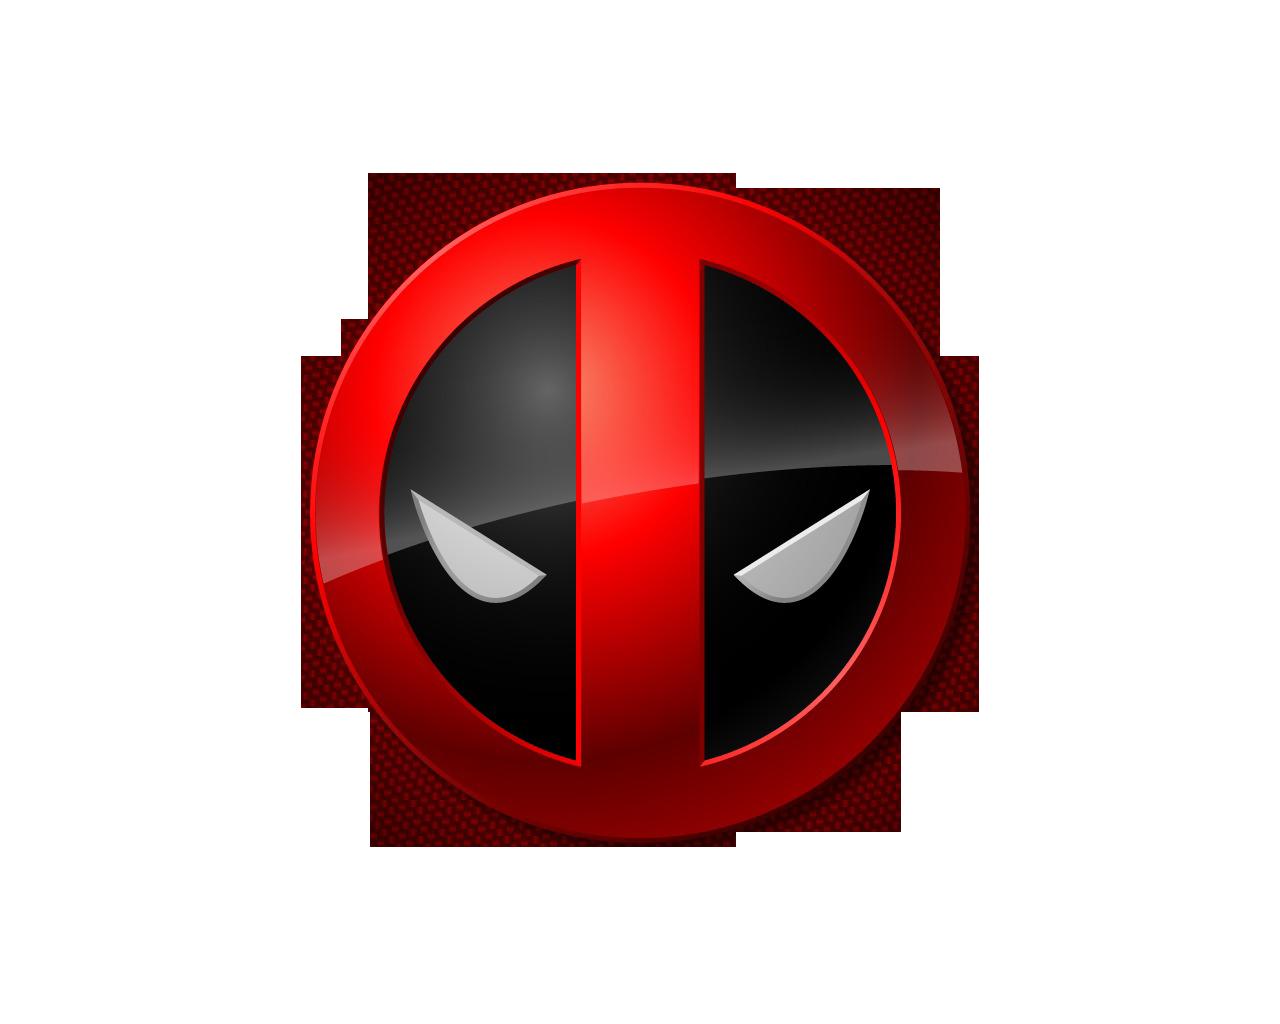 Deadpool Icon Downolad By Antoniomasterperes On Deviantart Deadpool Logo Wallpaper Deadpool Symbol Deadpool Logo